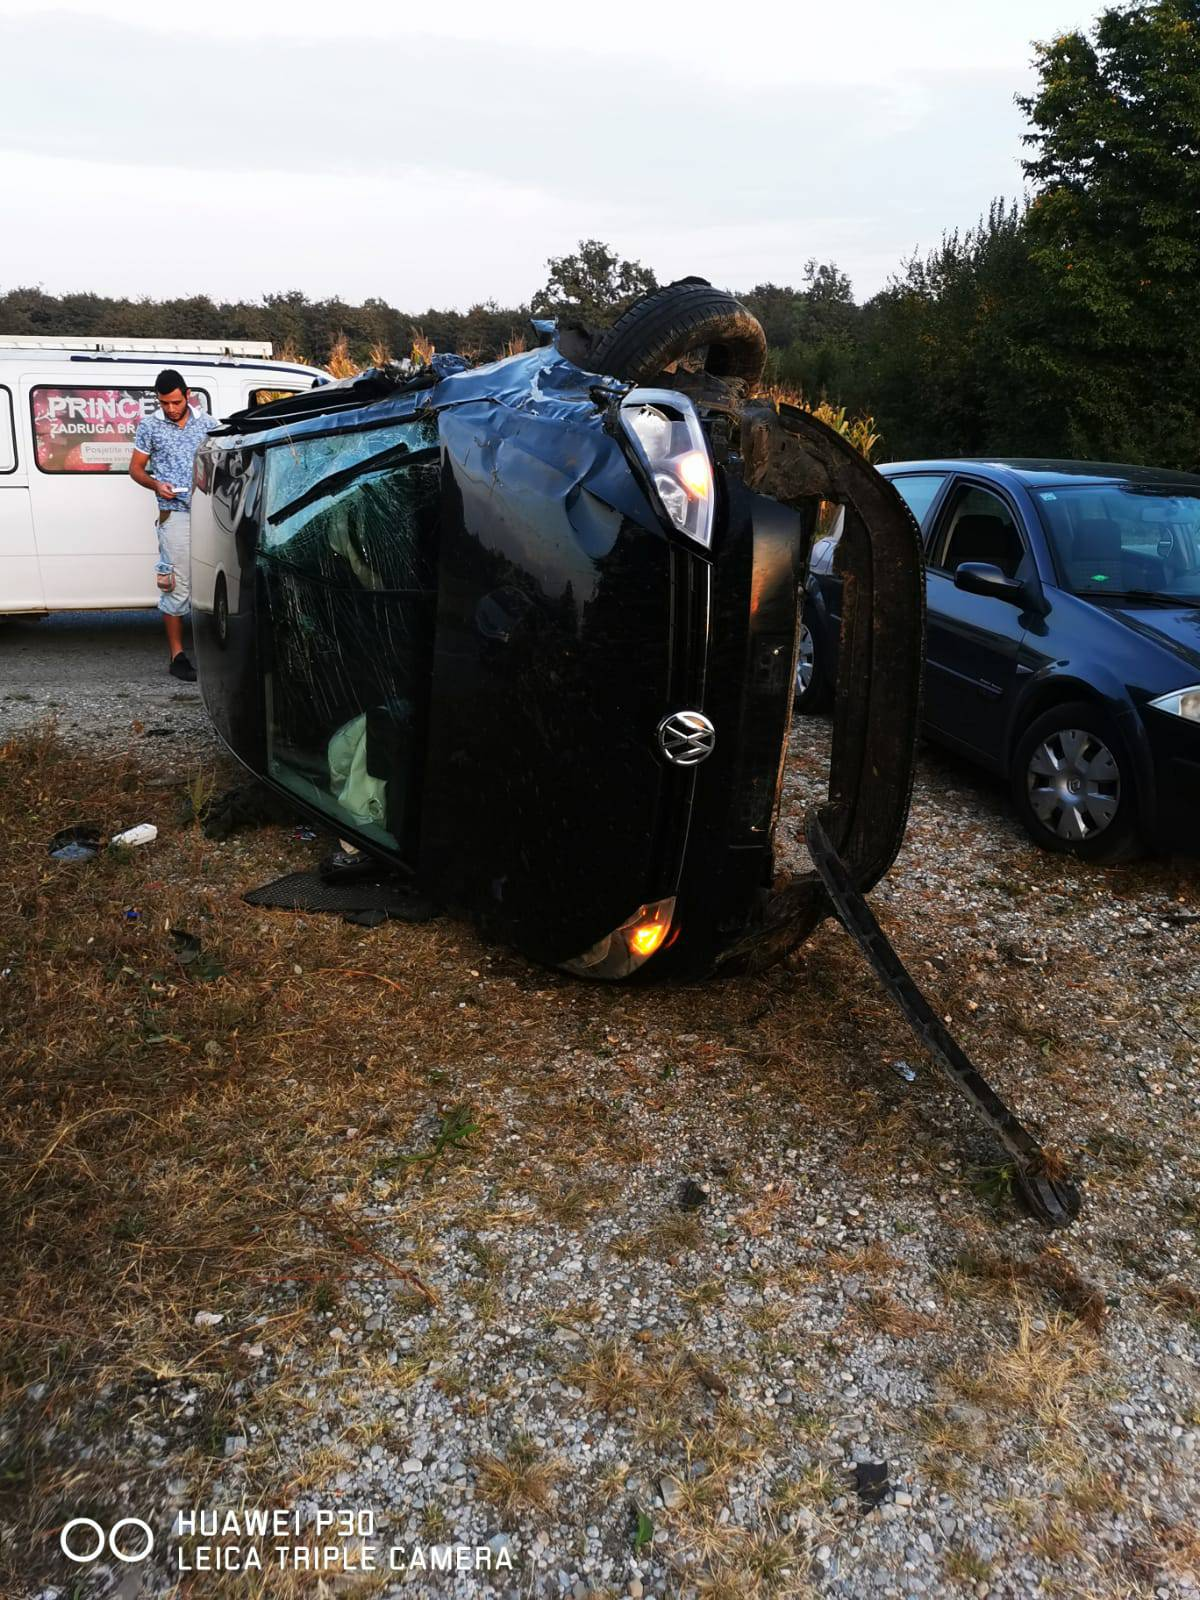 Nesreća kod Zagreba: Golf se preokrenuo na bok na cesti